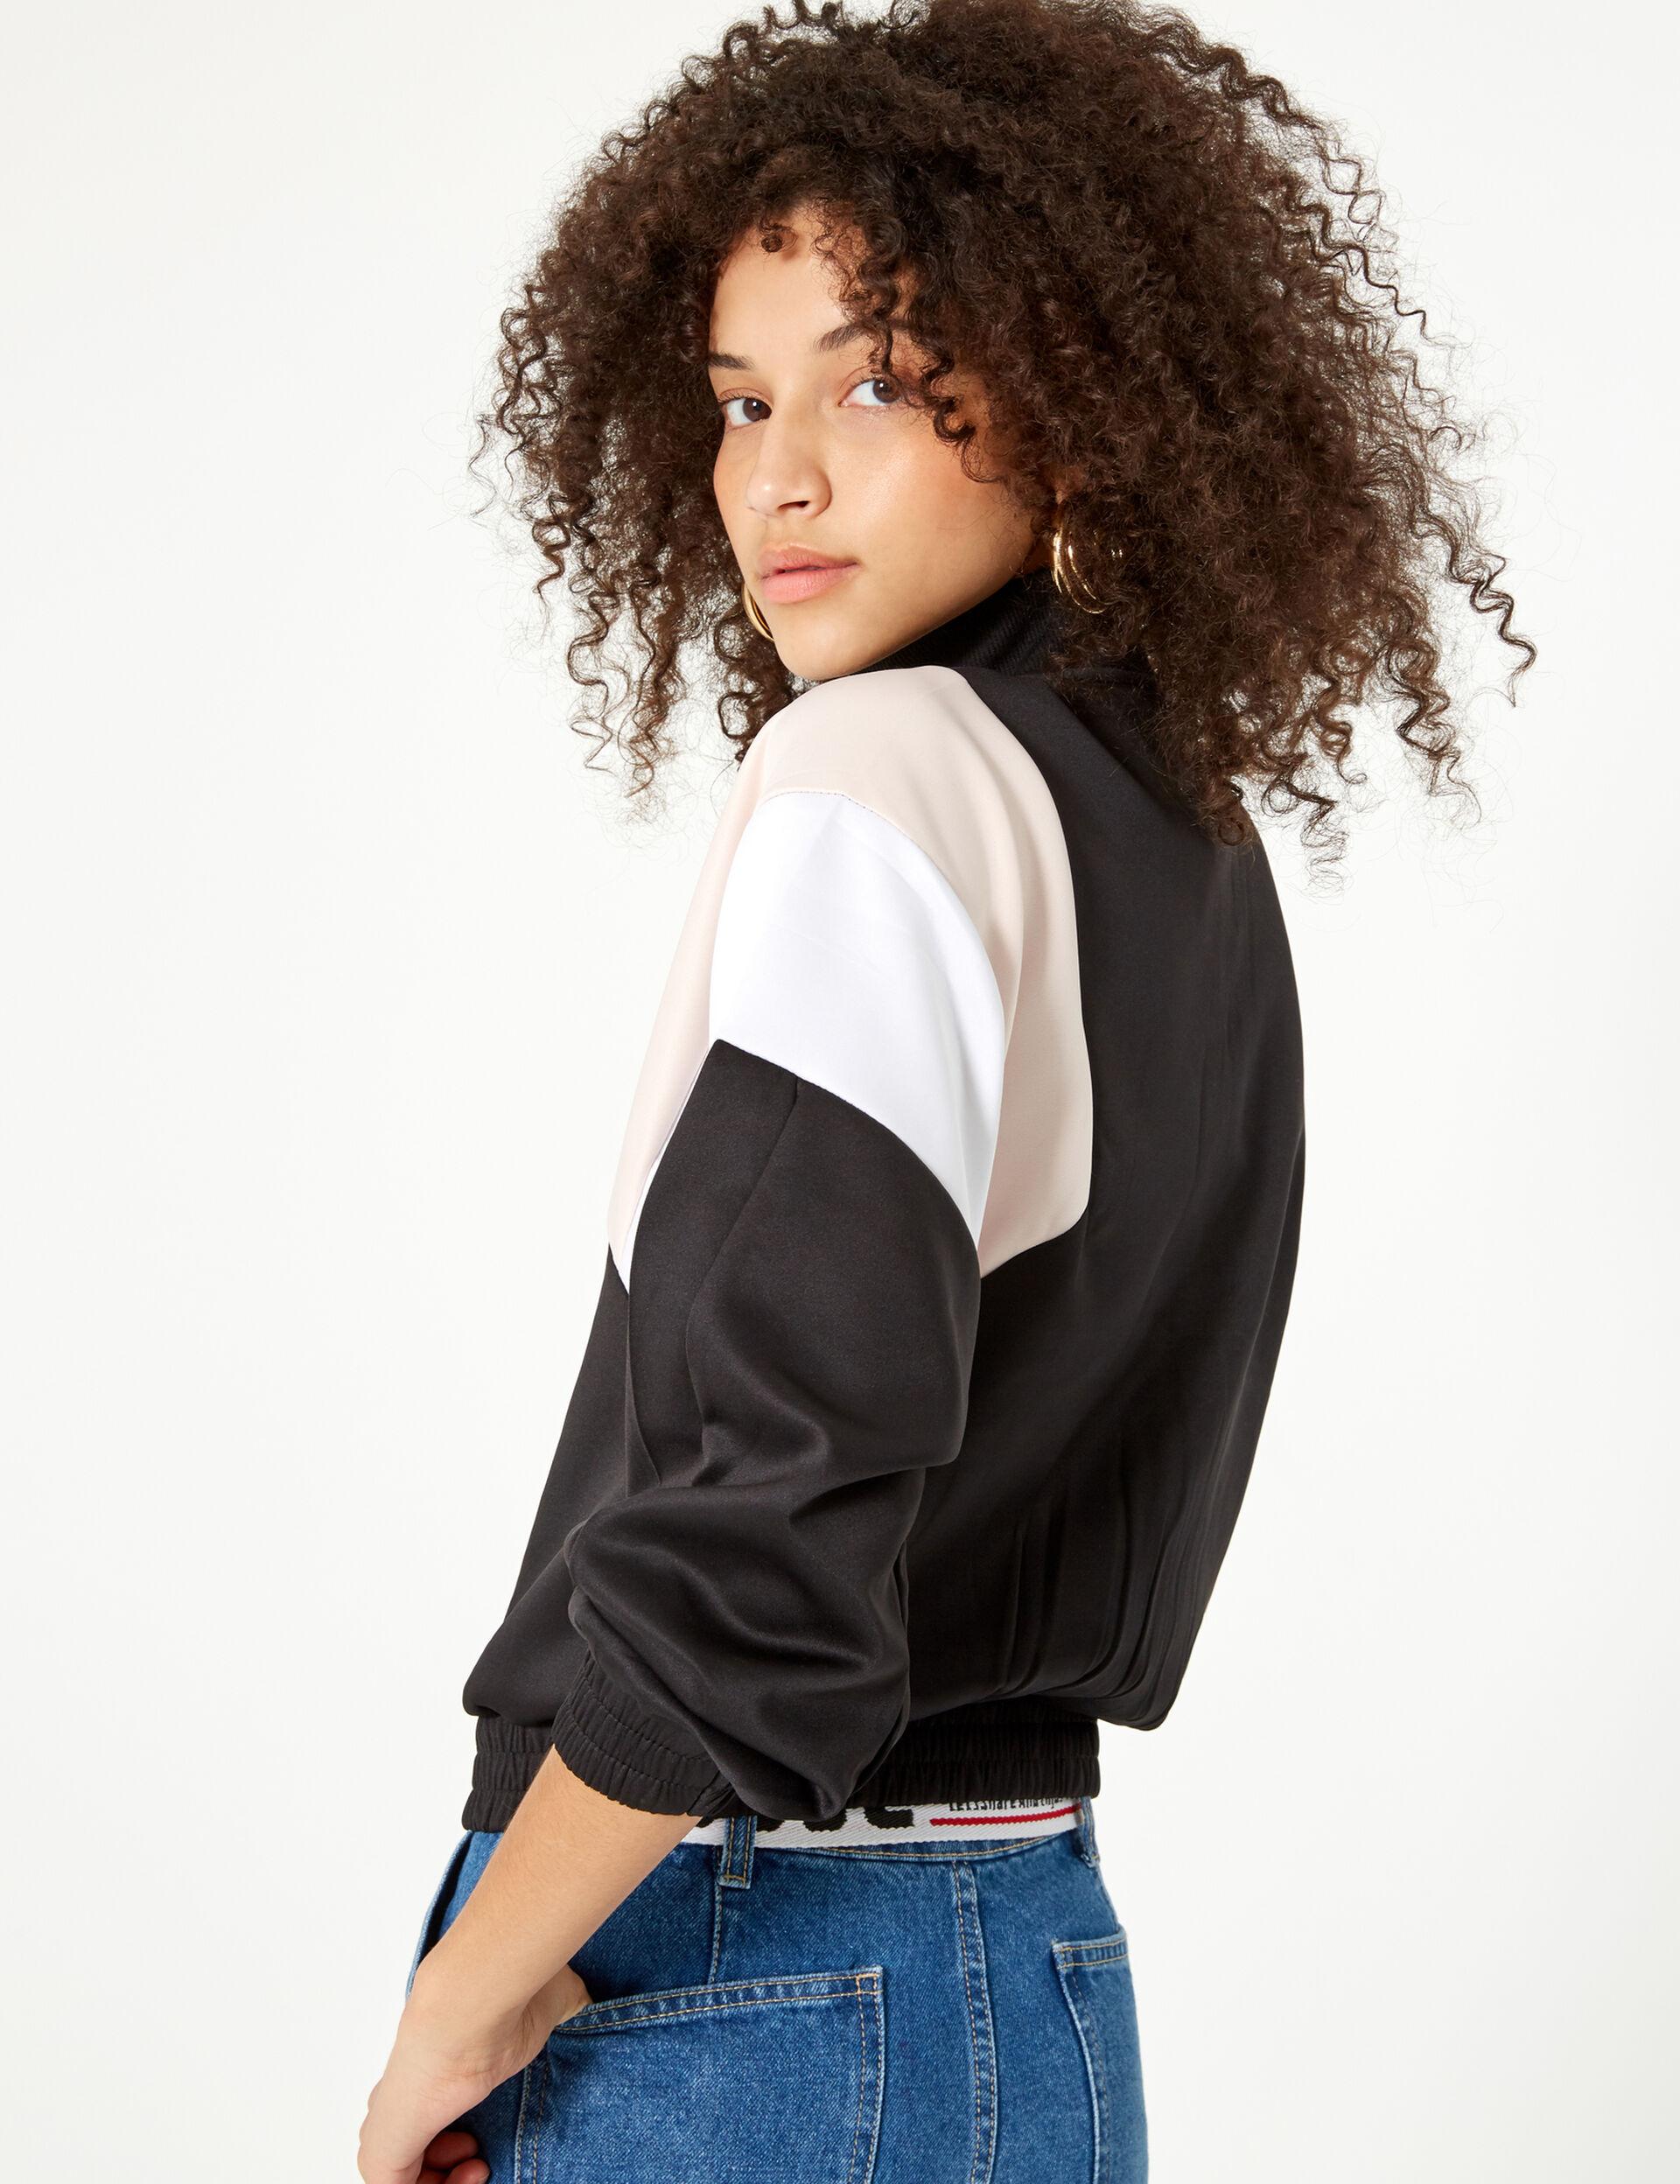 Black, white and pale pink zip-up jogging jacket